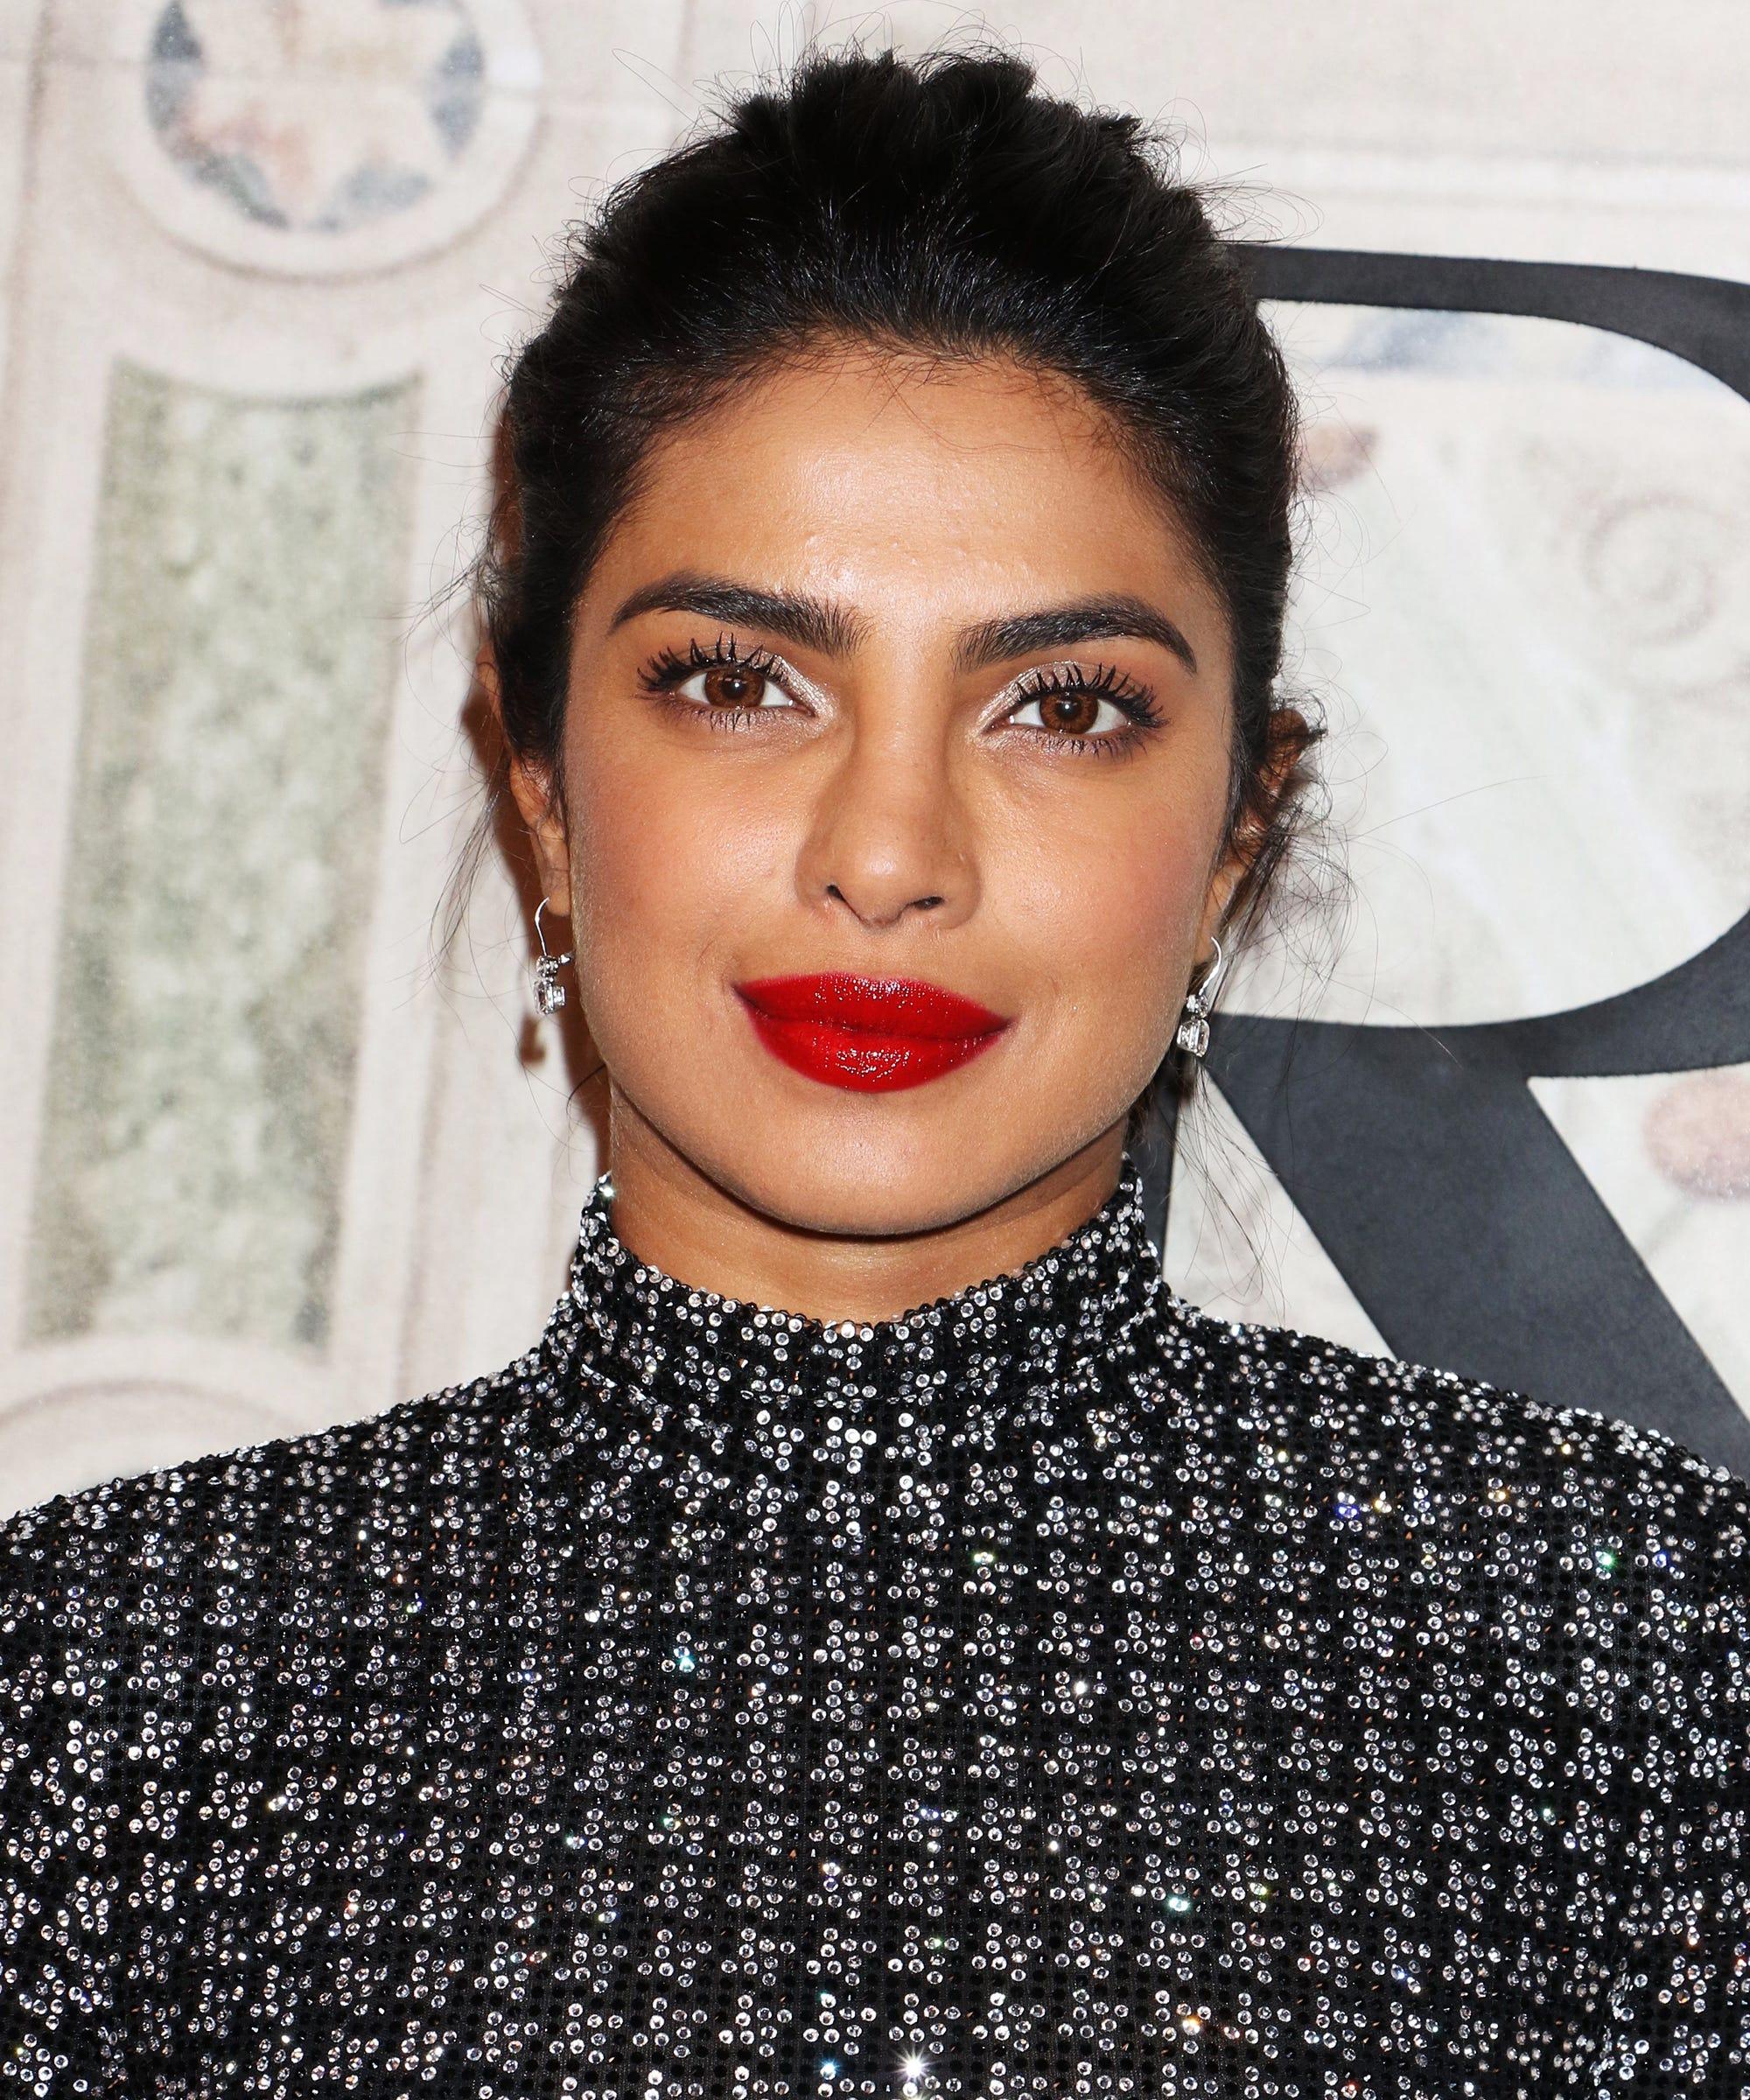 Priyanka Chopra S Makeup Artist S Best Beauty Advice